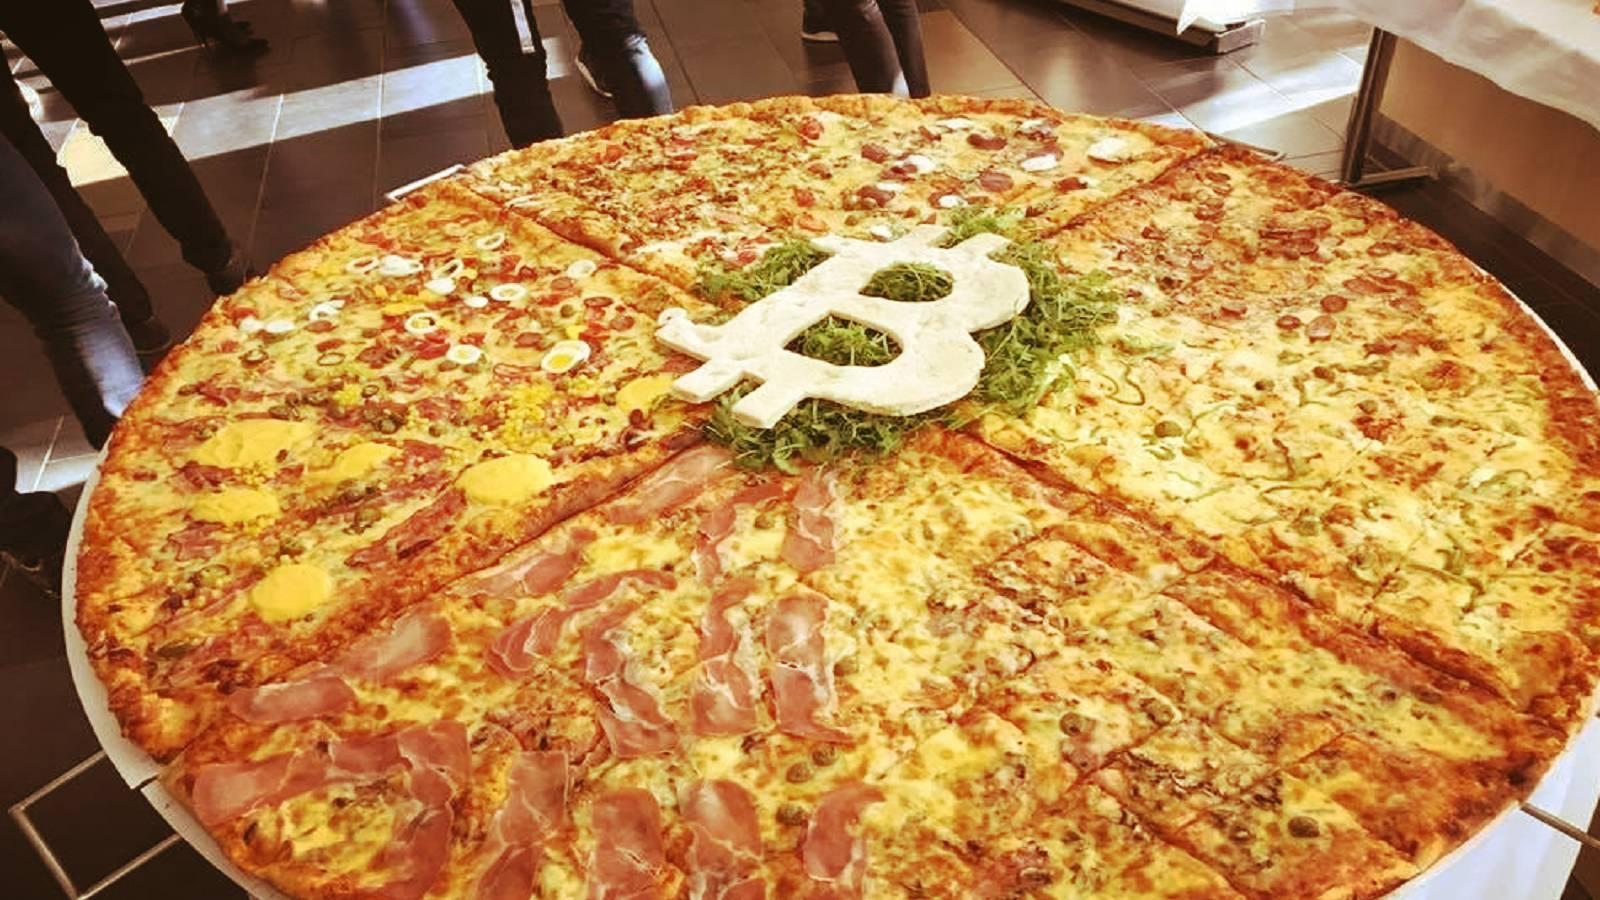 https://bayanbox.ir/view/3330403952017324740/bitcoin-pizza-day.jpg